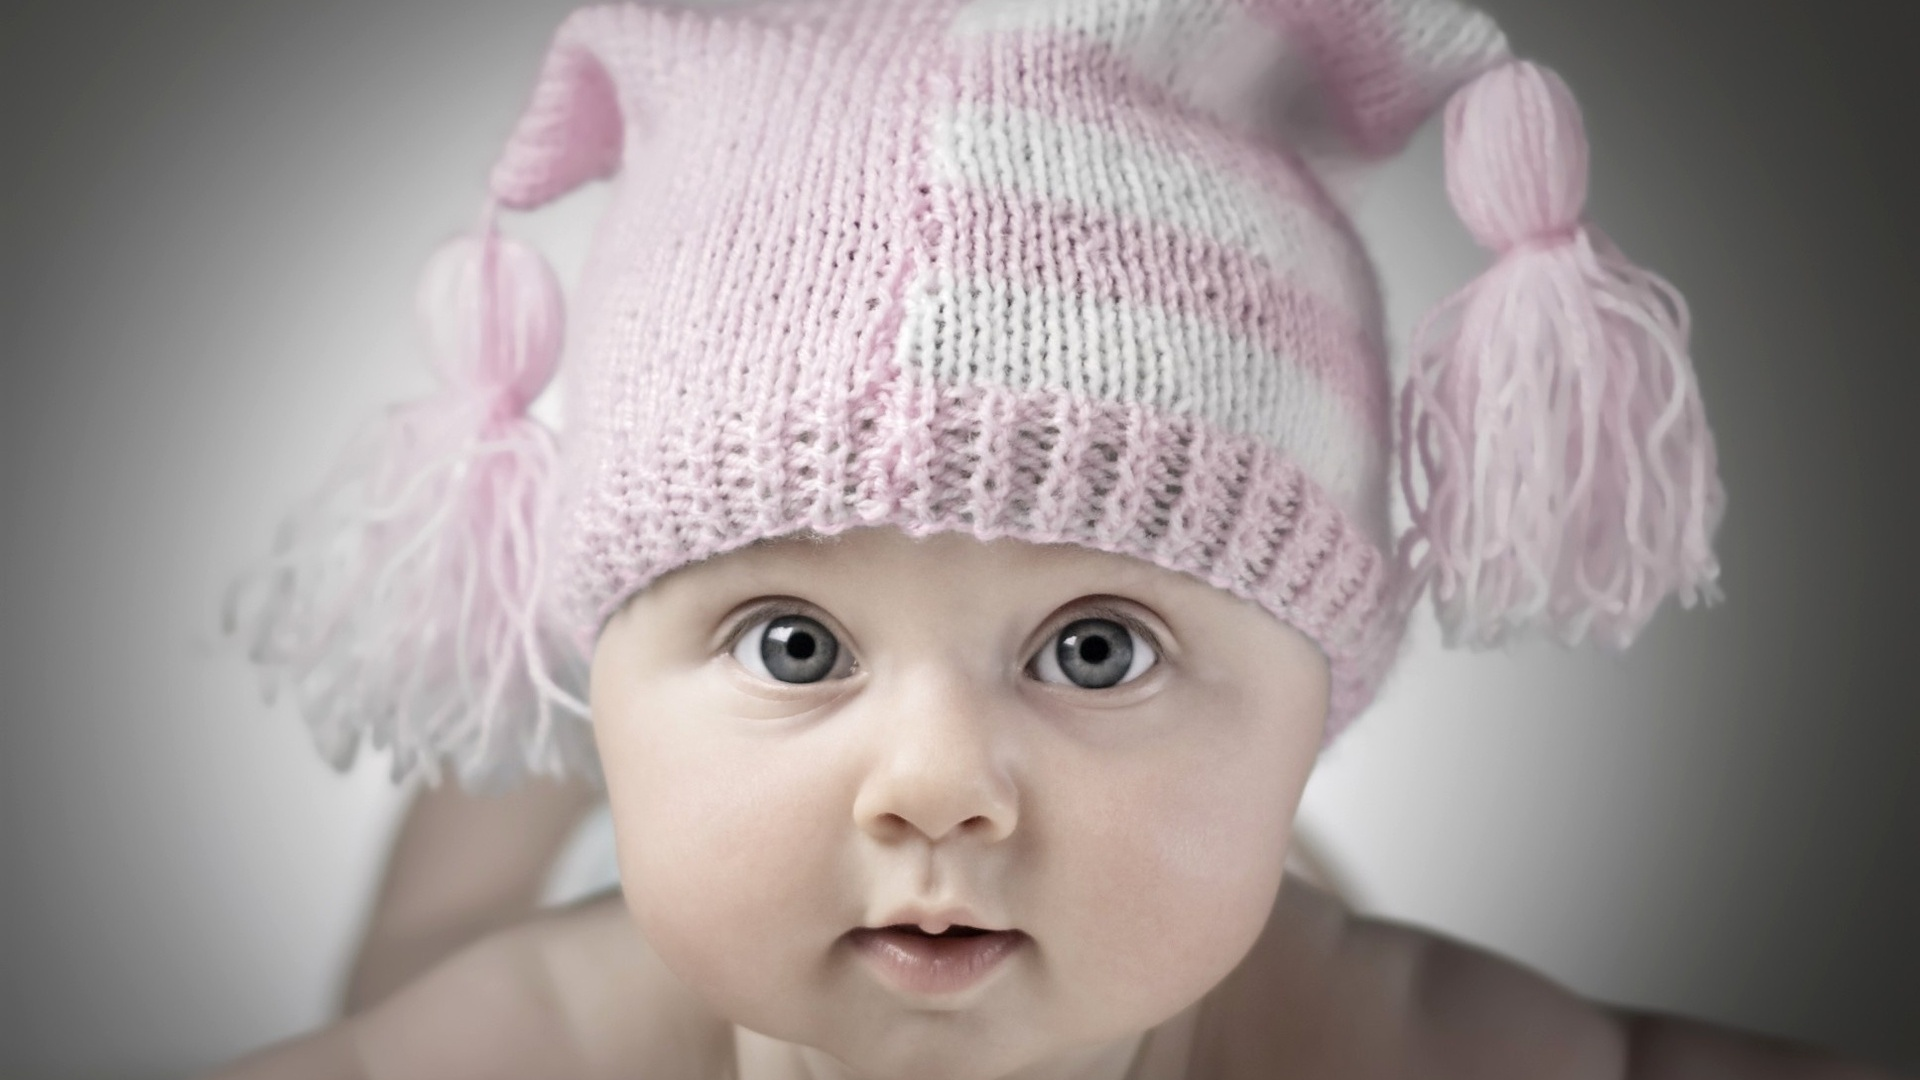 Cute Baby Wallpaper 1920x1080